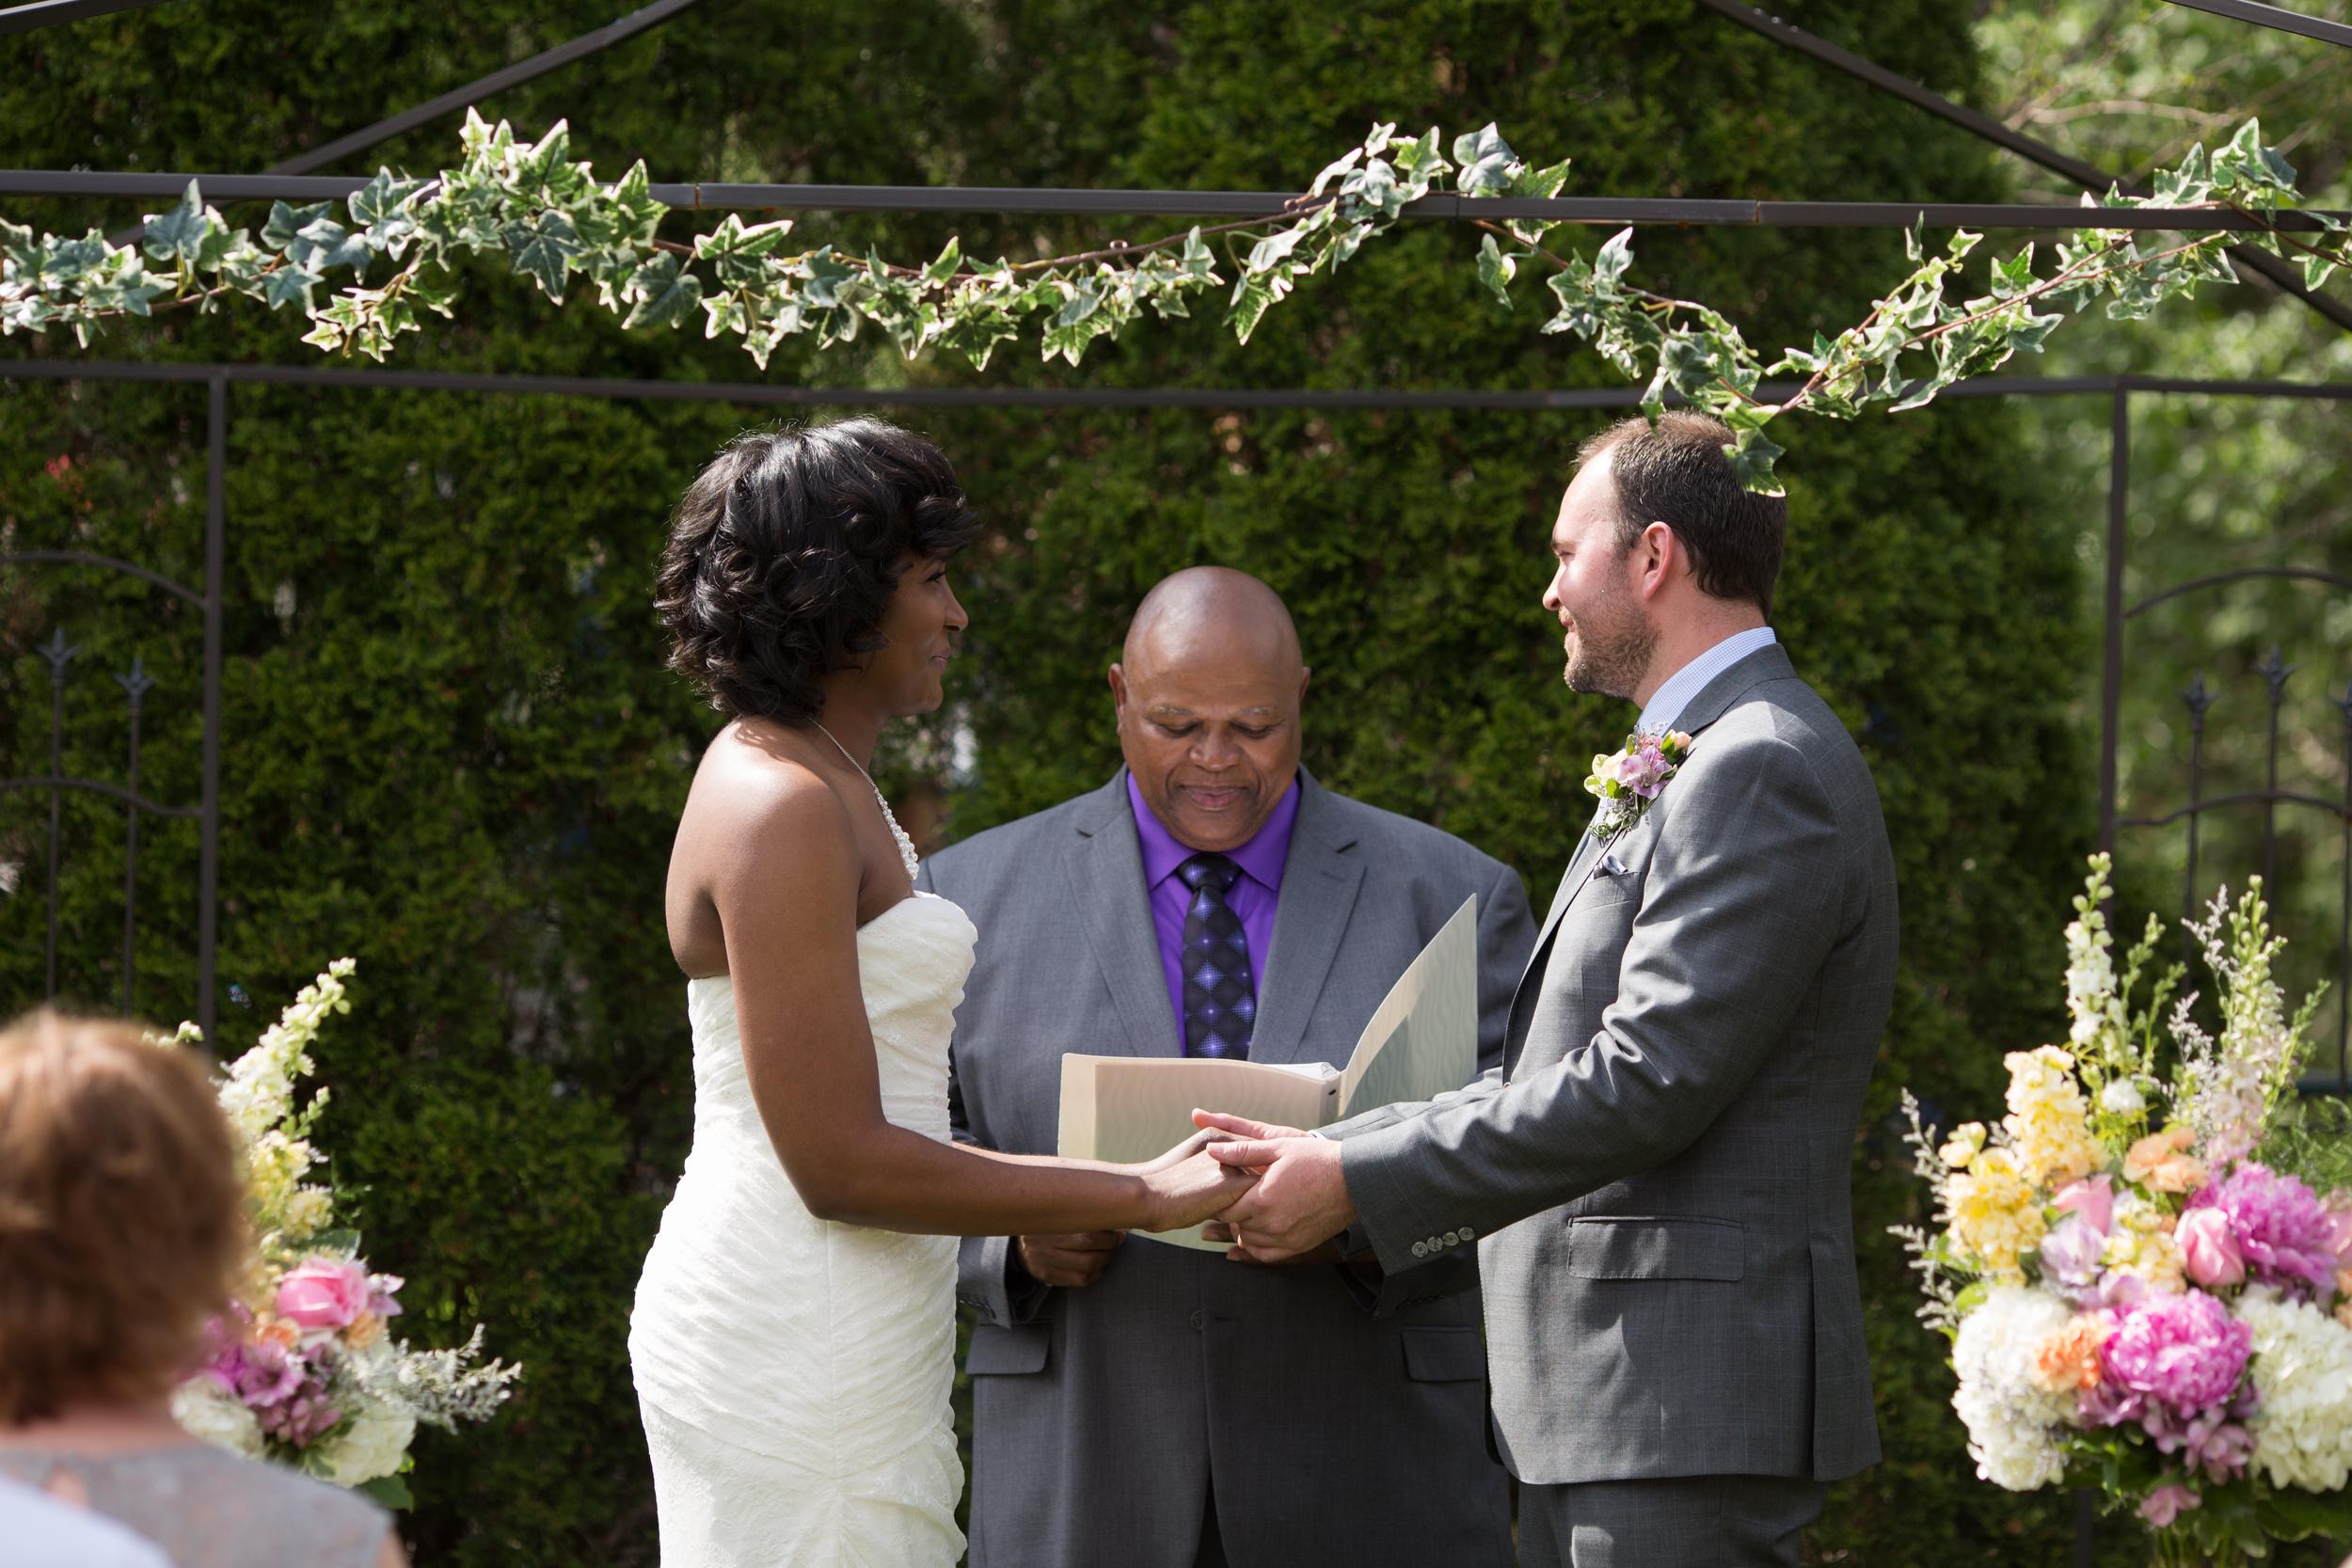 ann_arbor_weddings_004.JPG